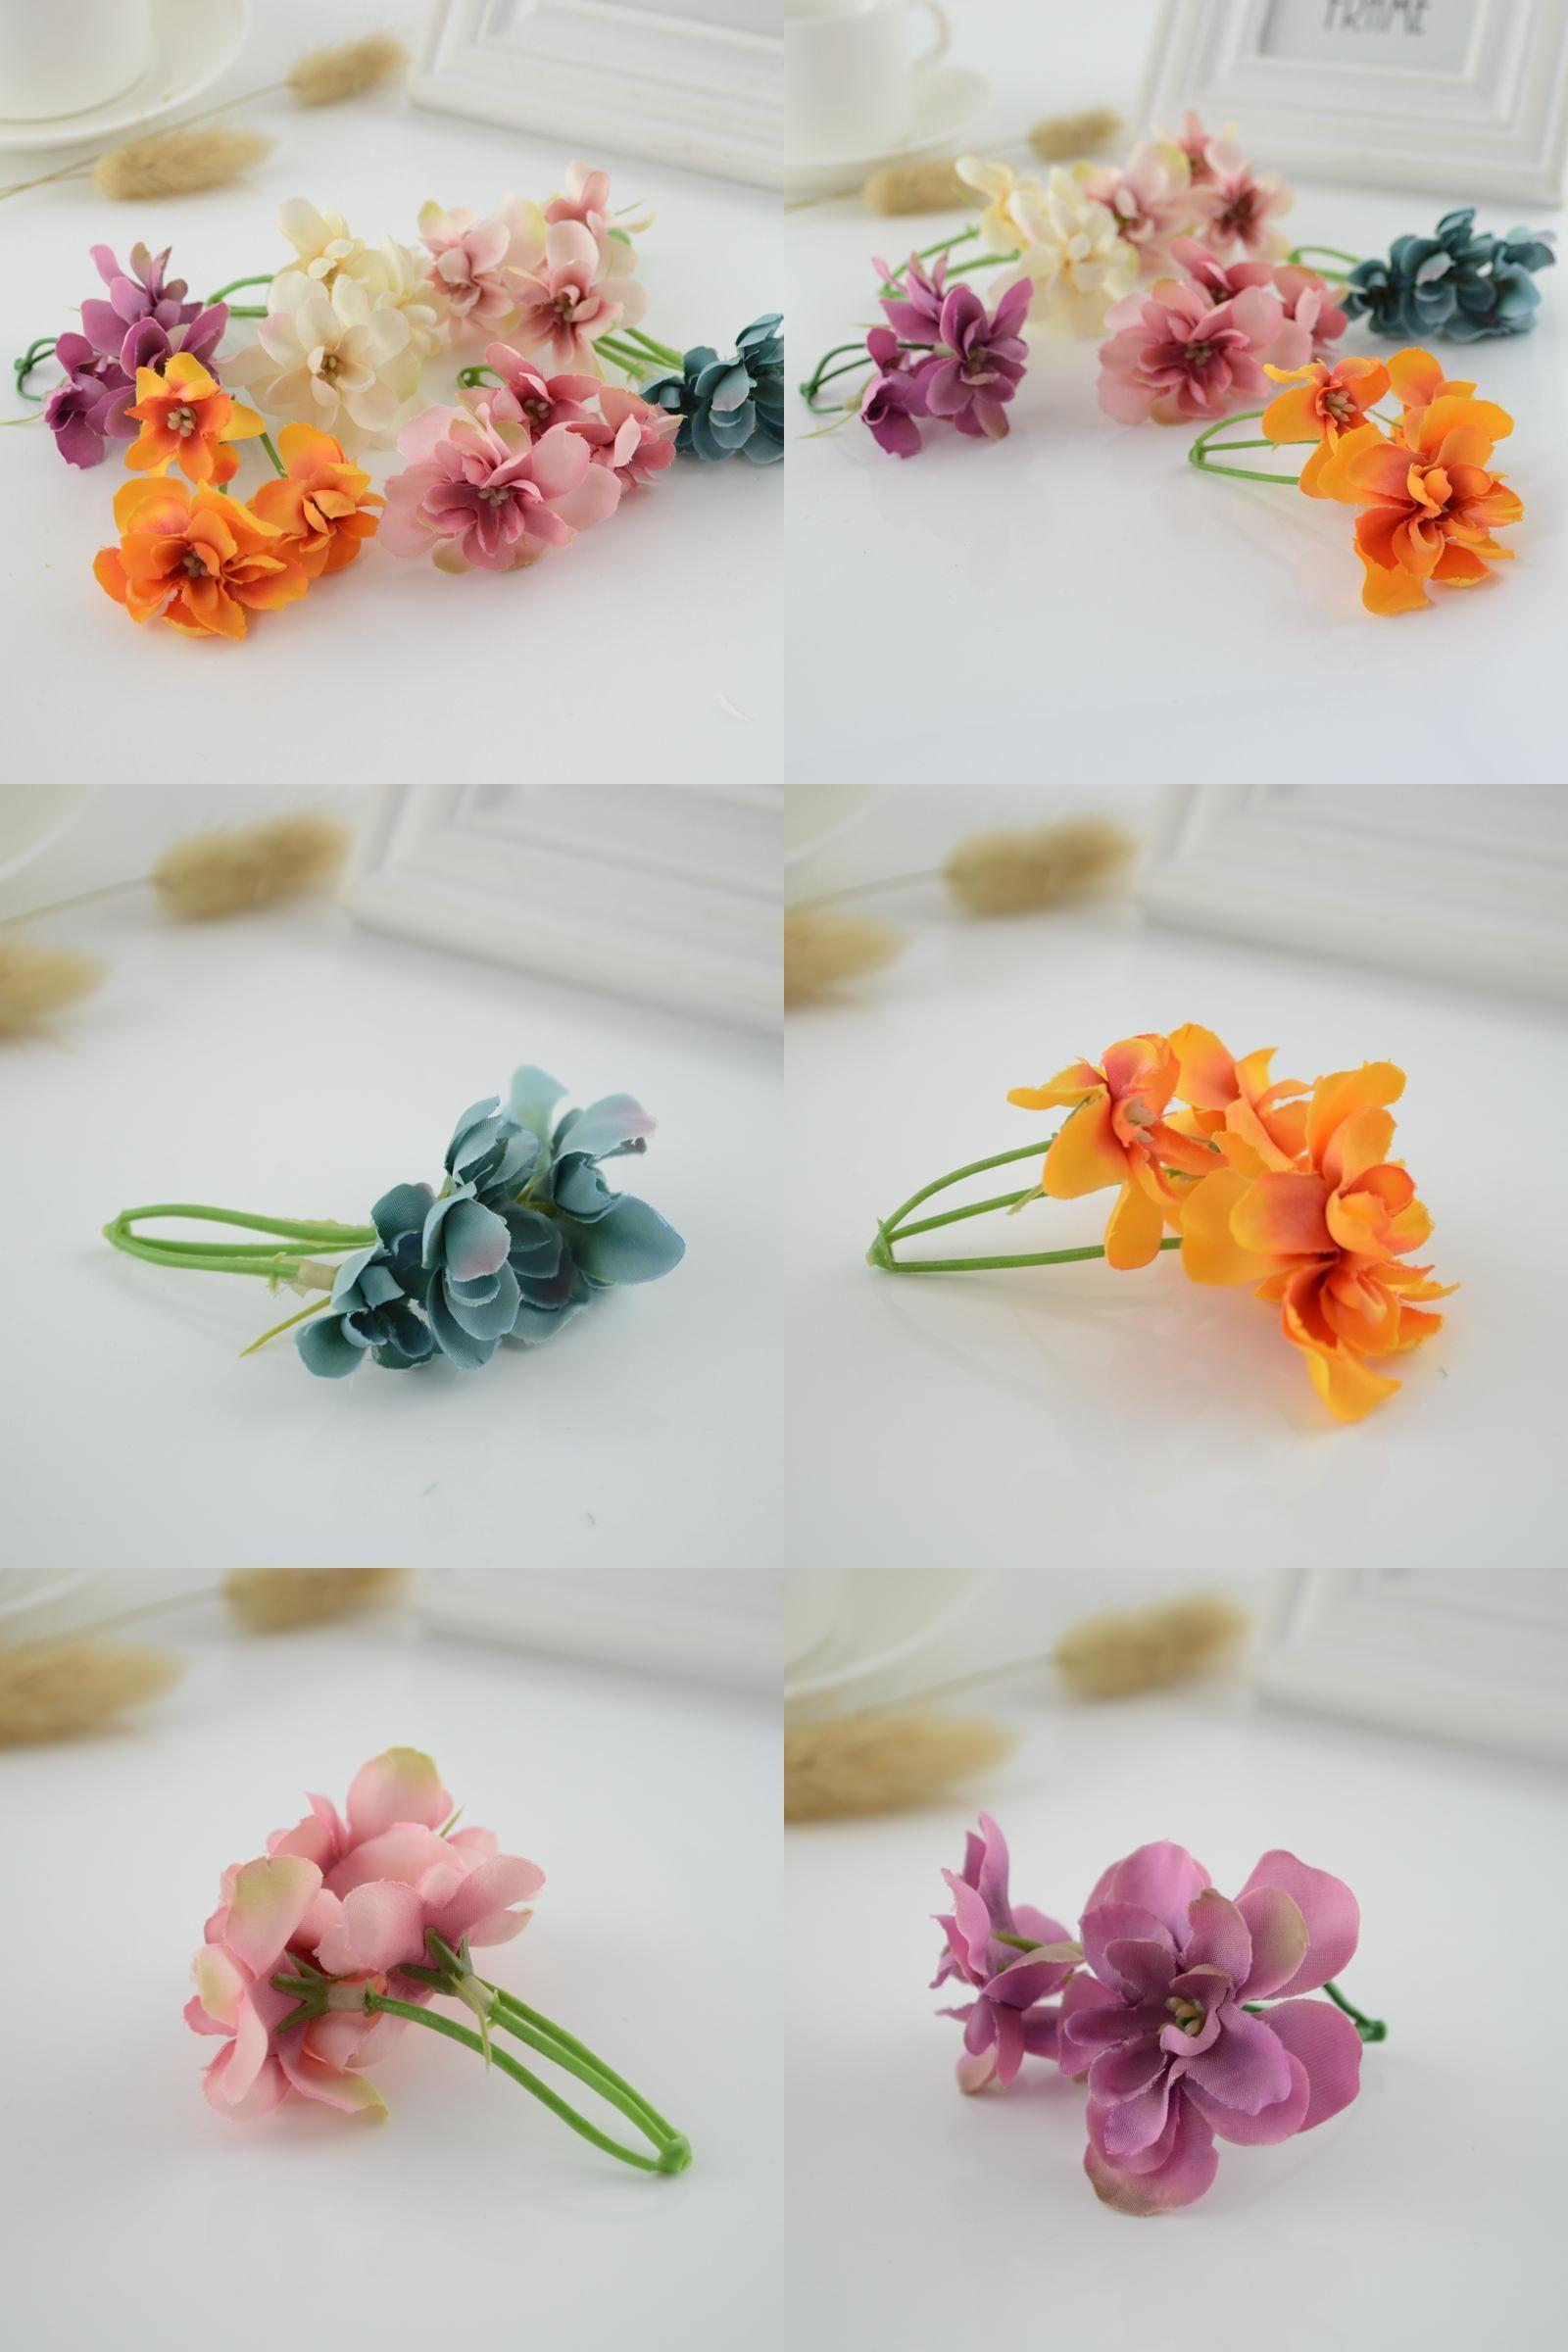 Visit To Buy 5pcs Retro Hydrangea Artificial Flowers Silk Cheap